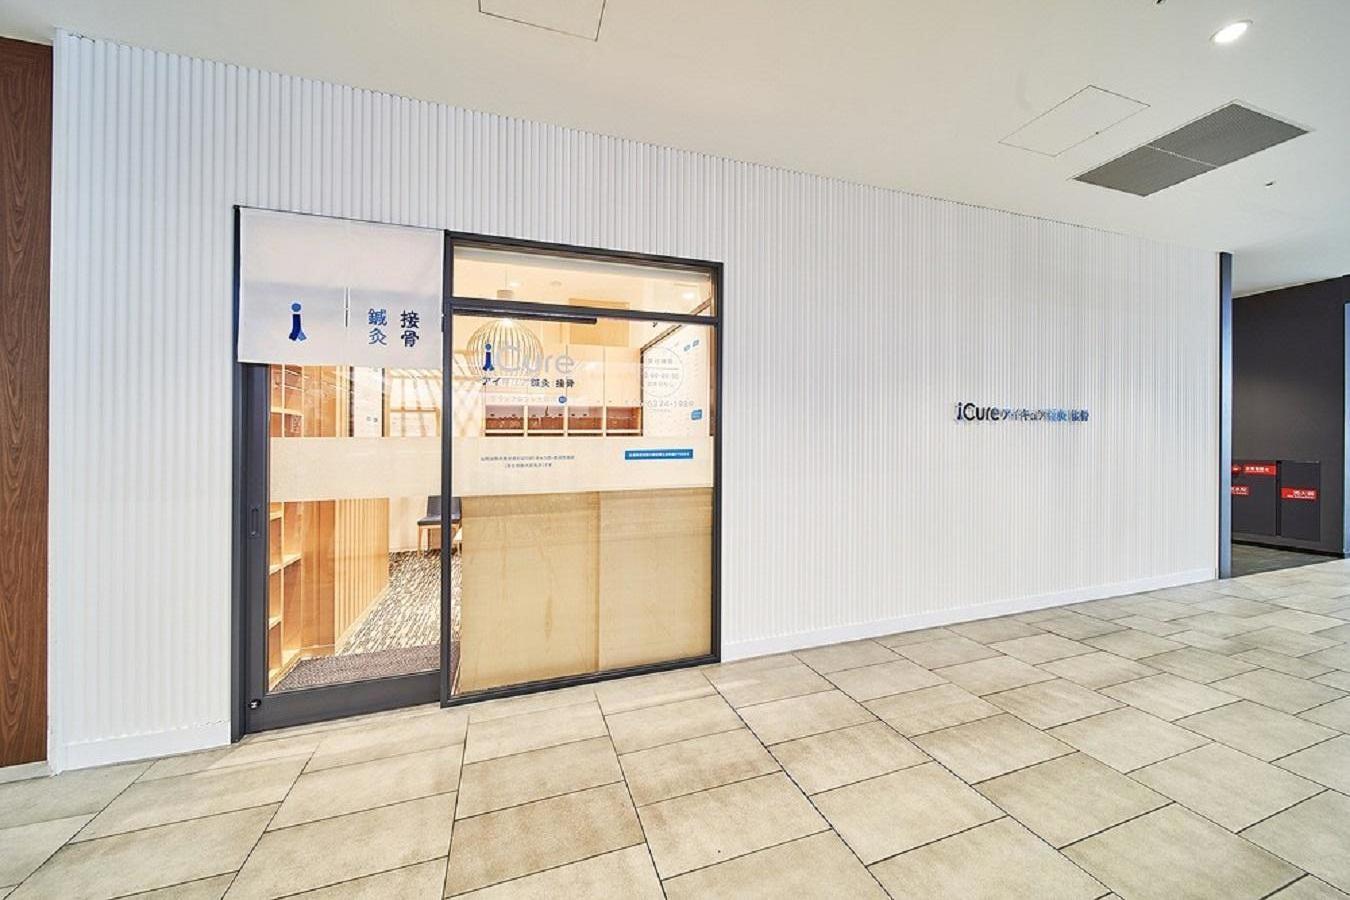 iCure鍼灸接骨院 グランフロント大阪